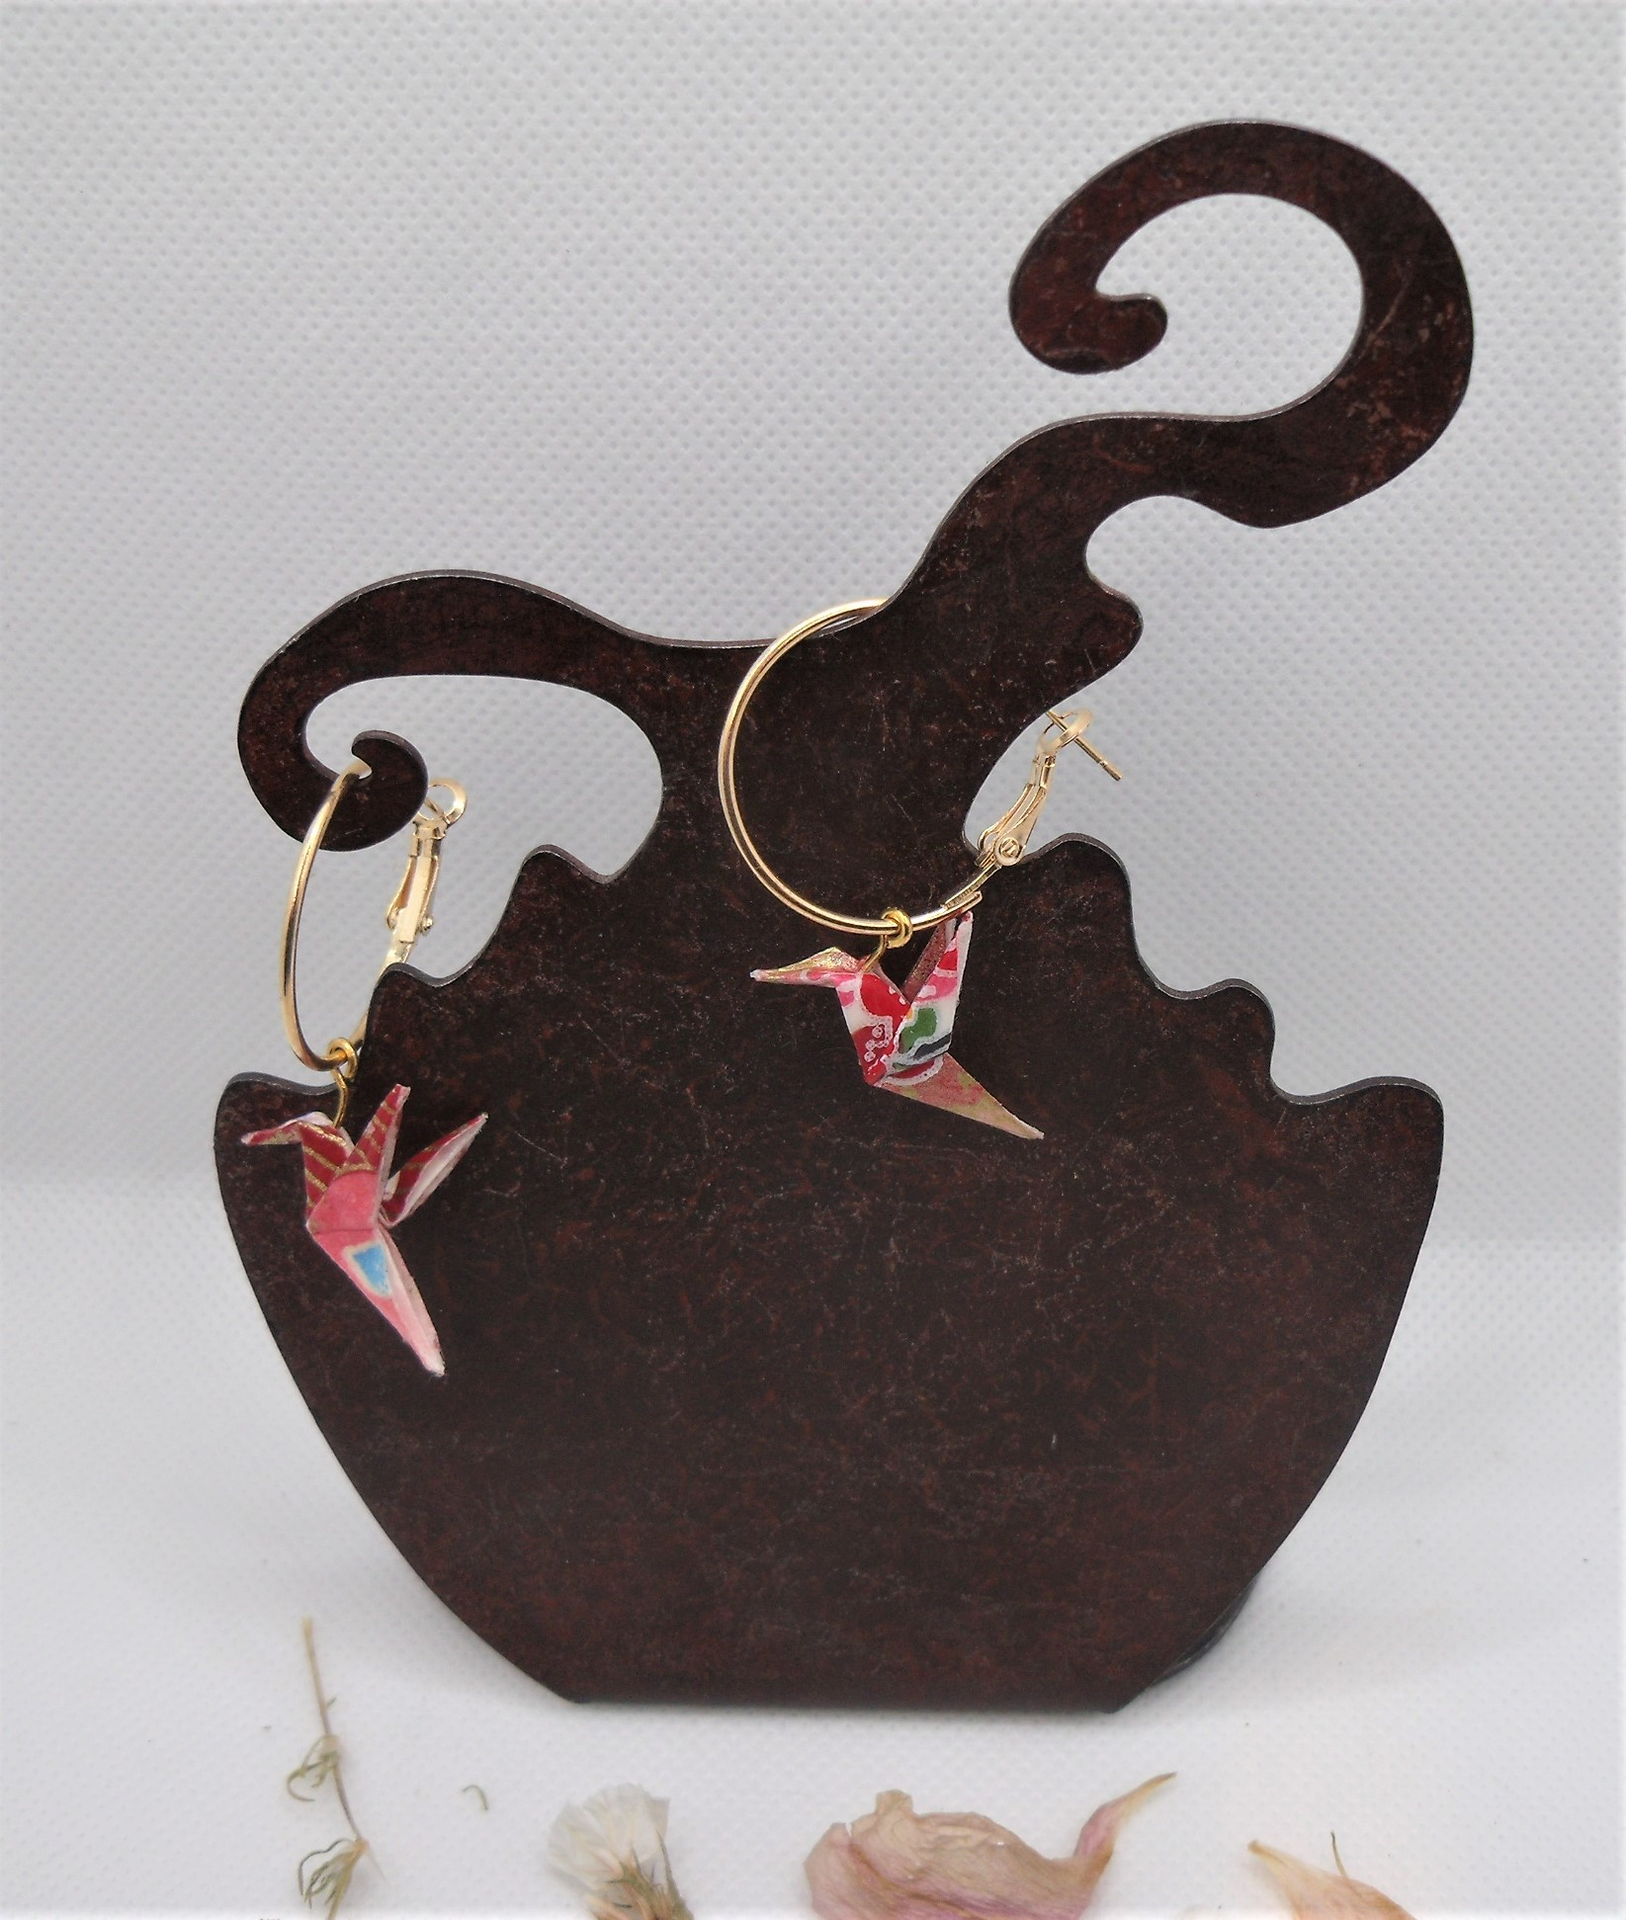 BOOco8 - 20€ - Boucles d'Oreilles Origami colombe - Miskatonic Shop